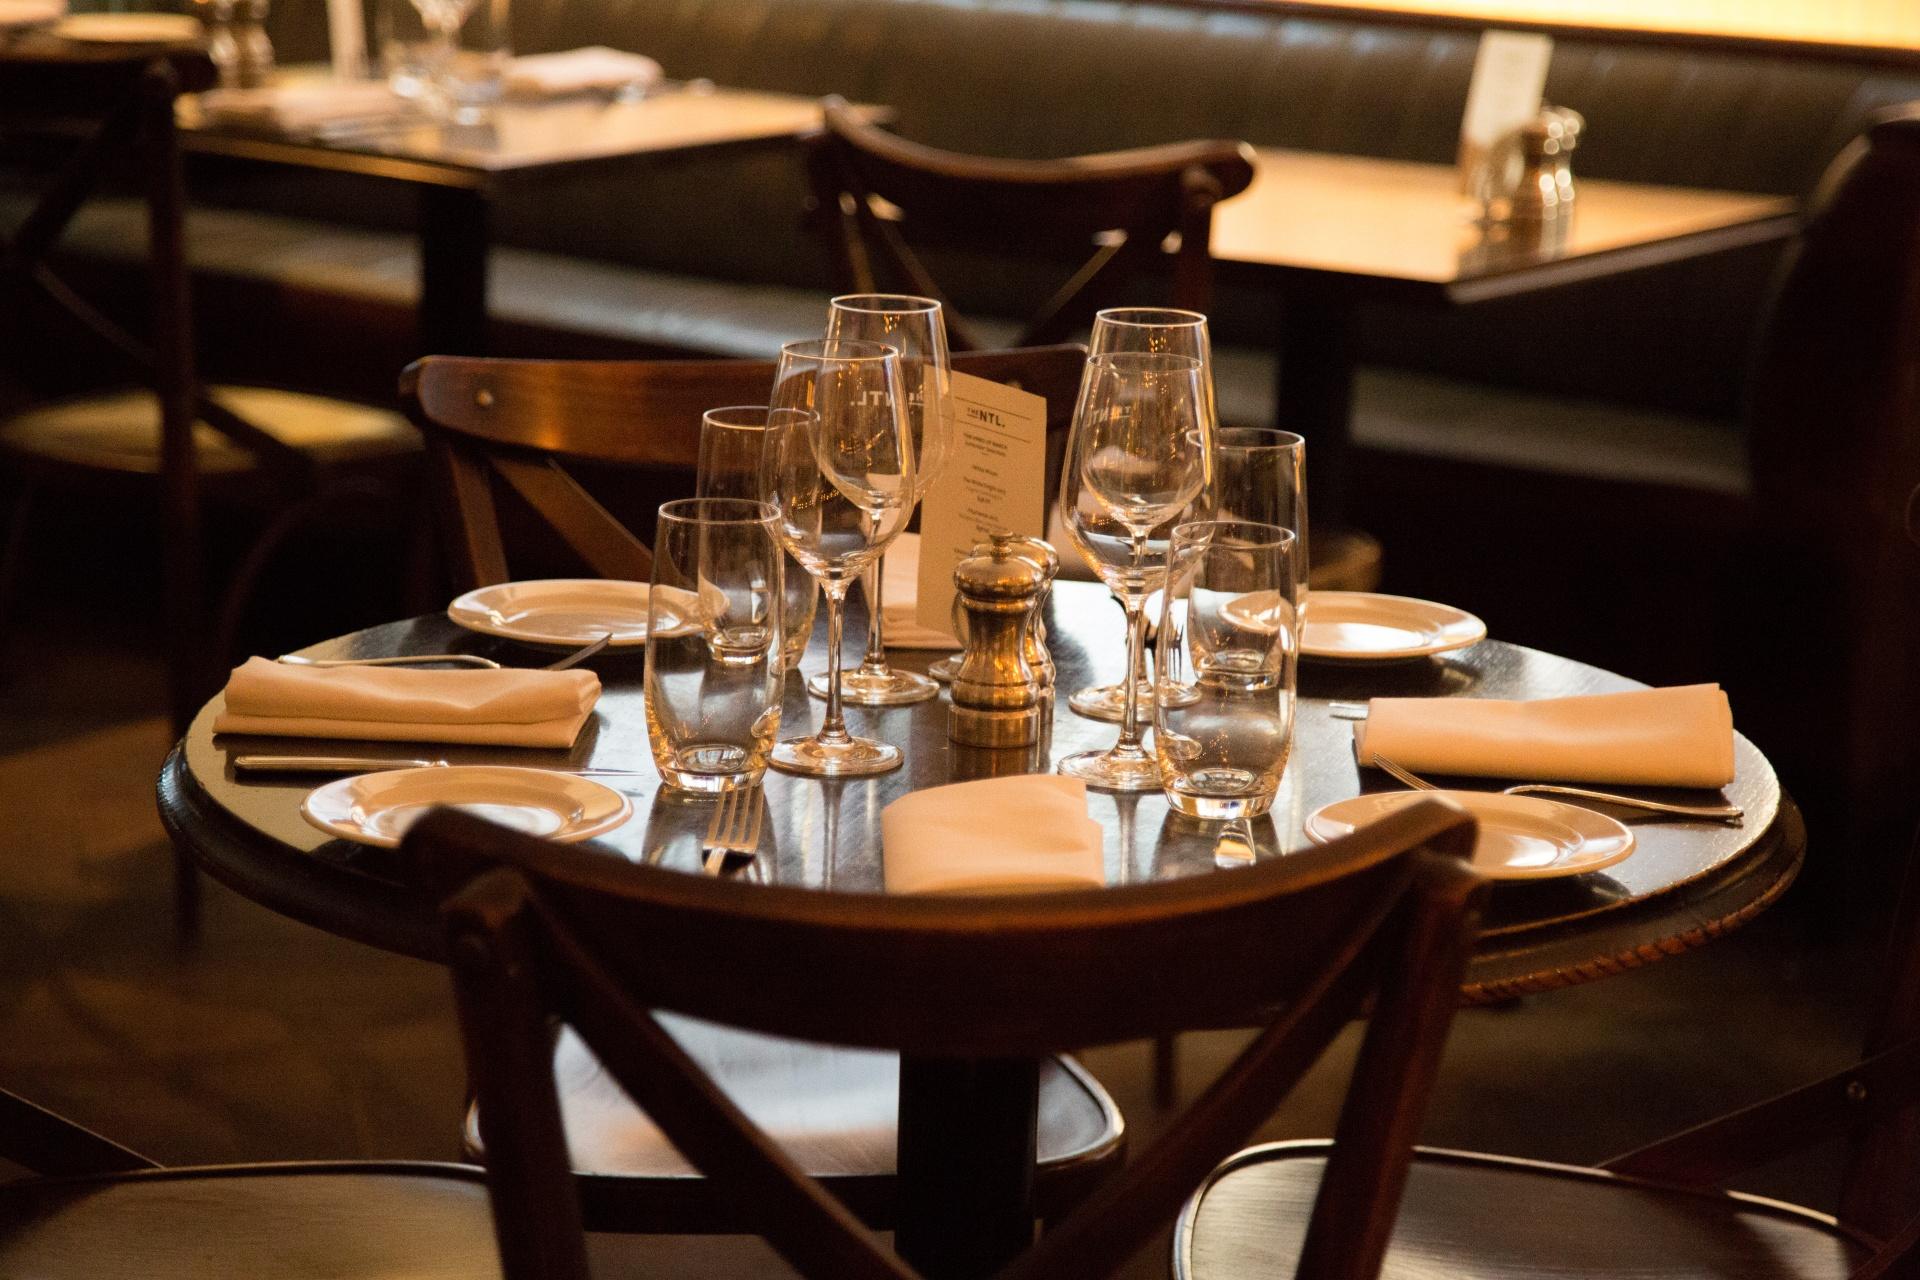 Restaurants, Restrooms, Eating